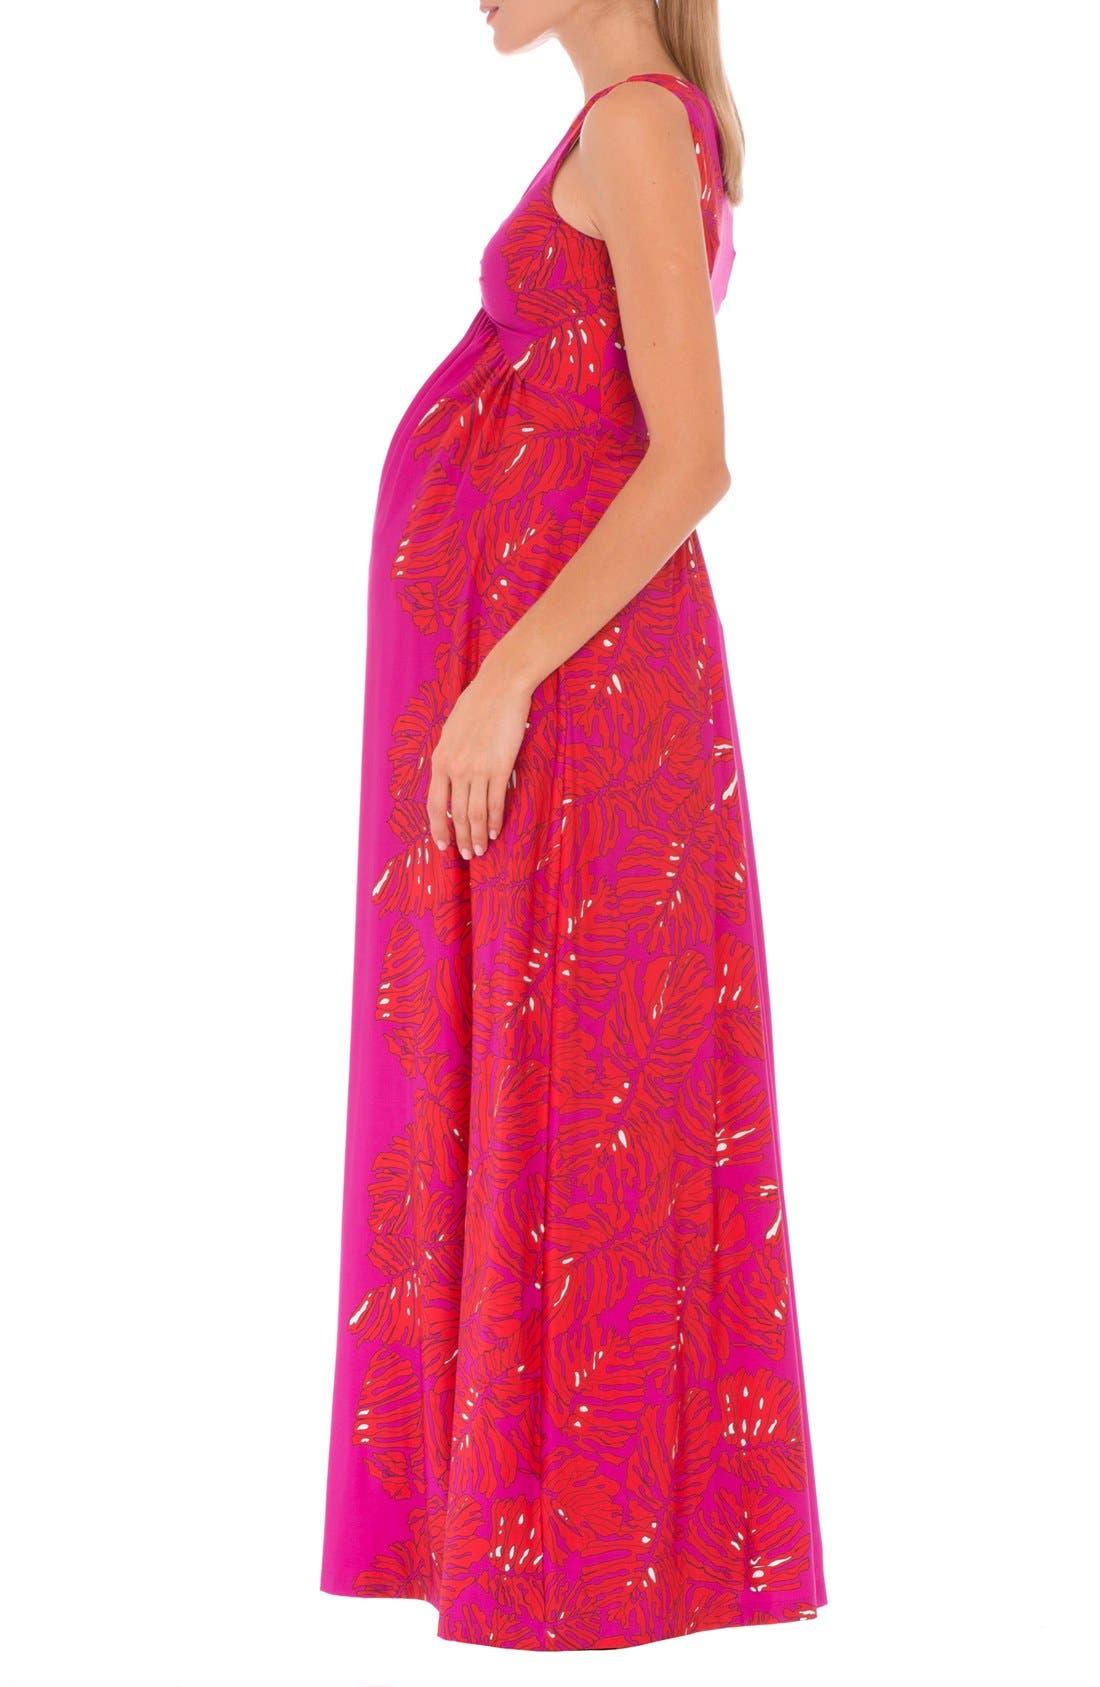 Scarlet Sleeveless Maternity Maxi Dress,                             Alternate thumbnail 4, color,                             RED